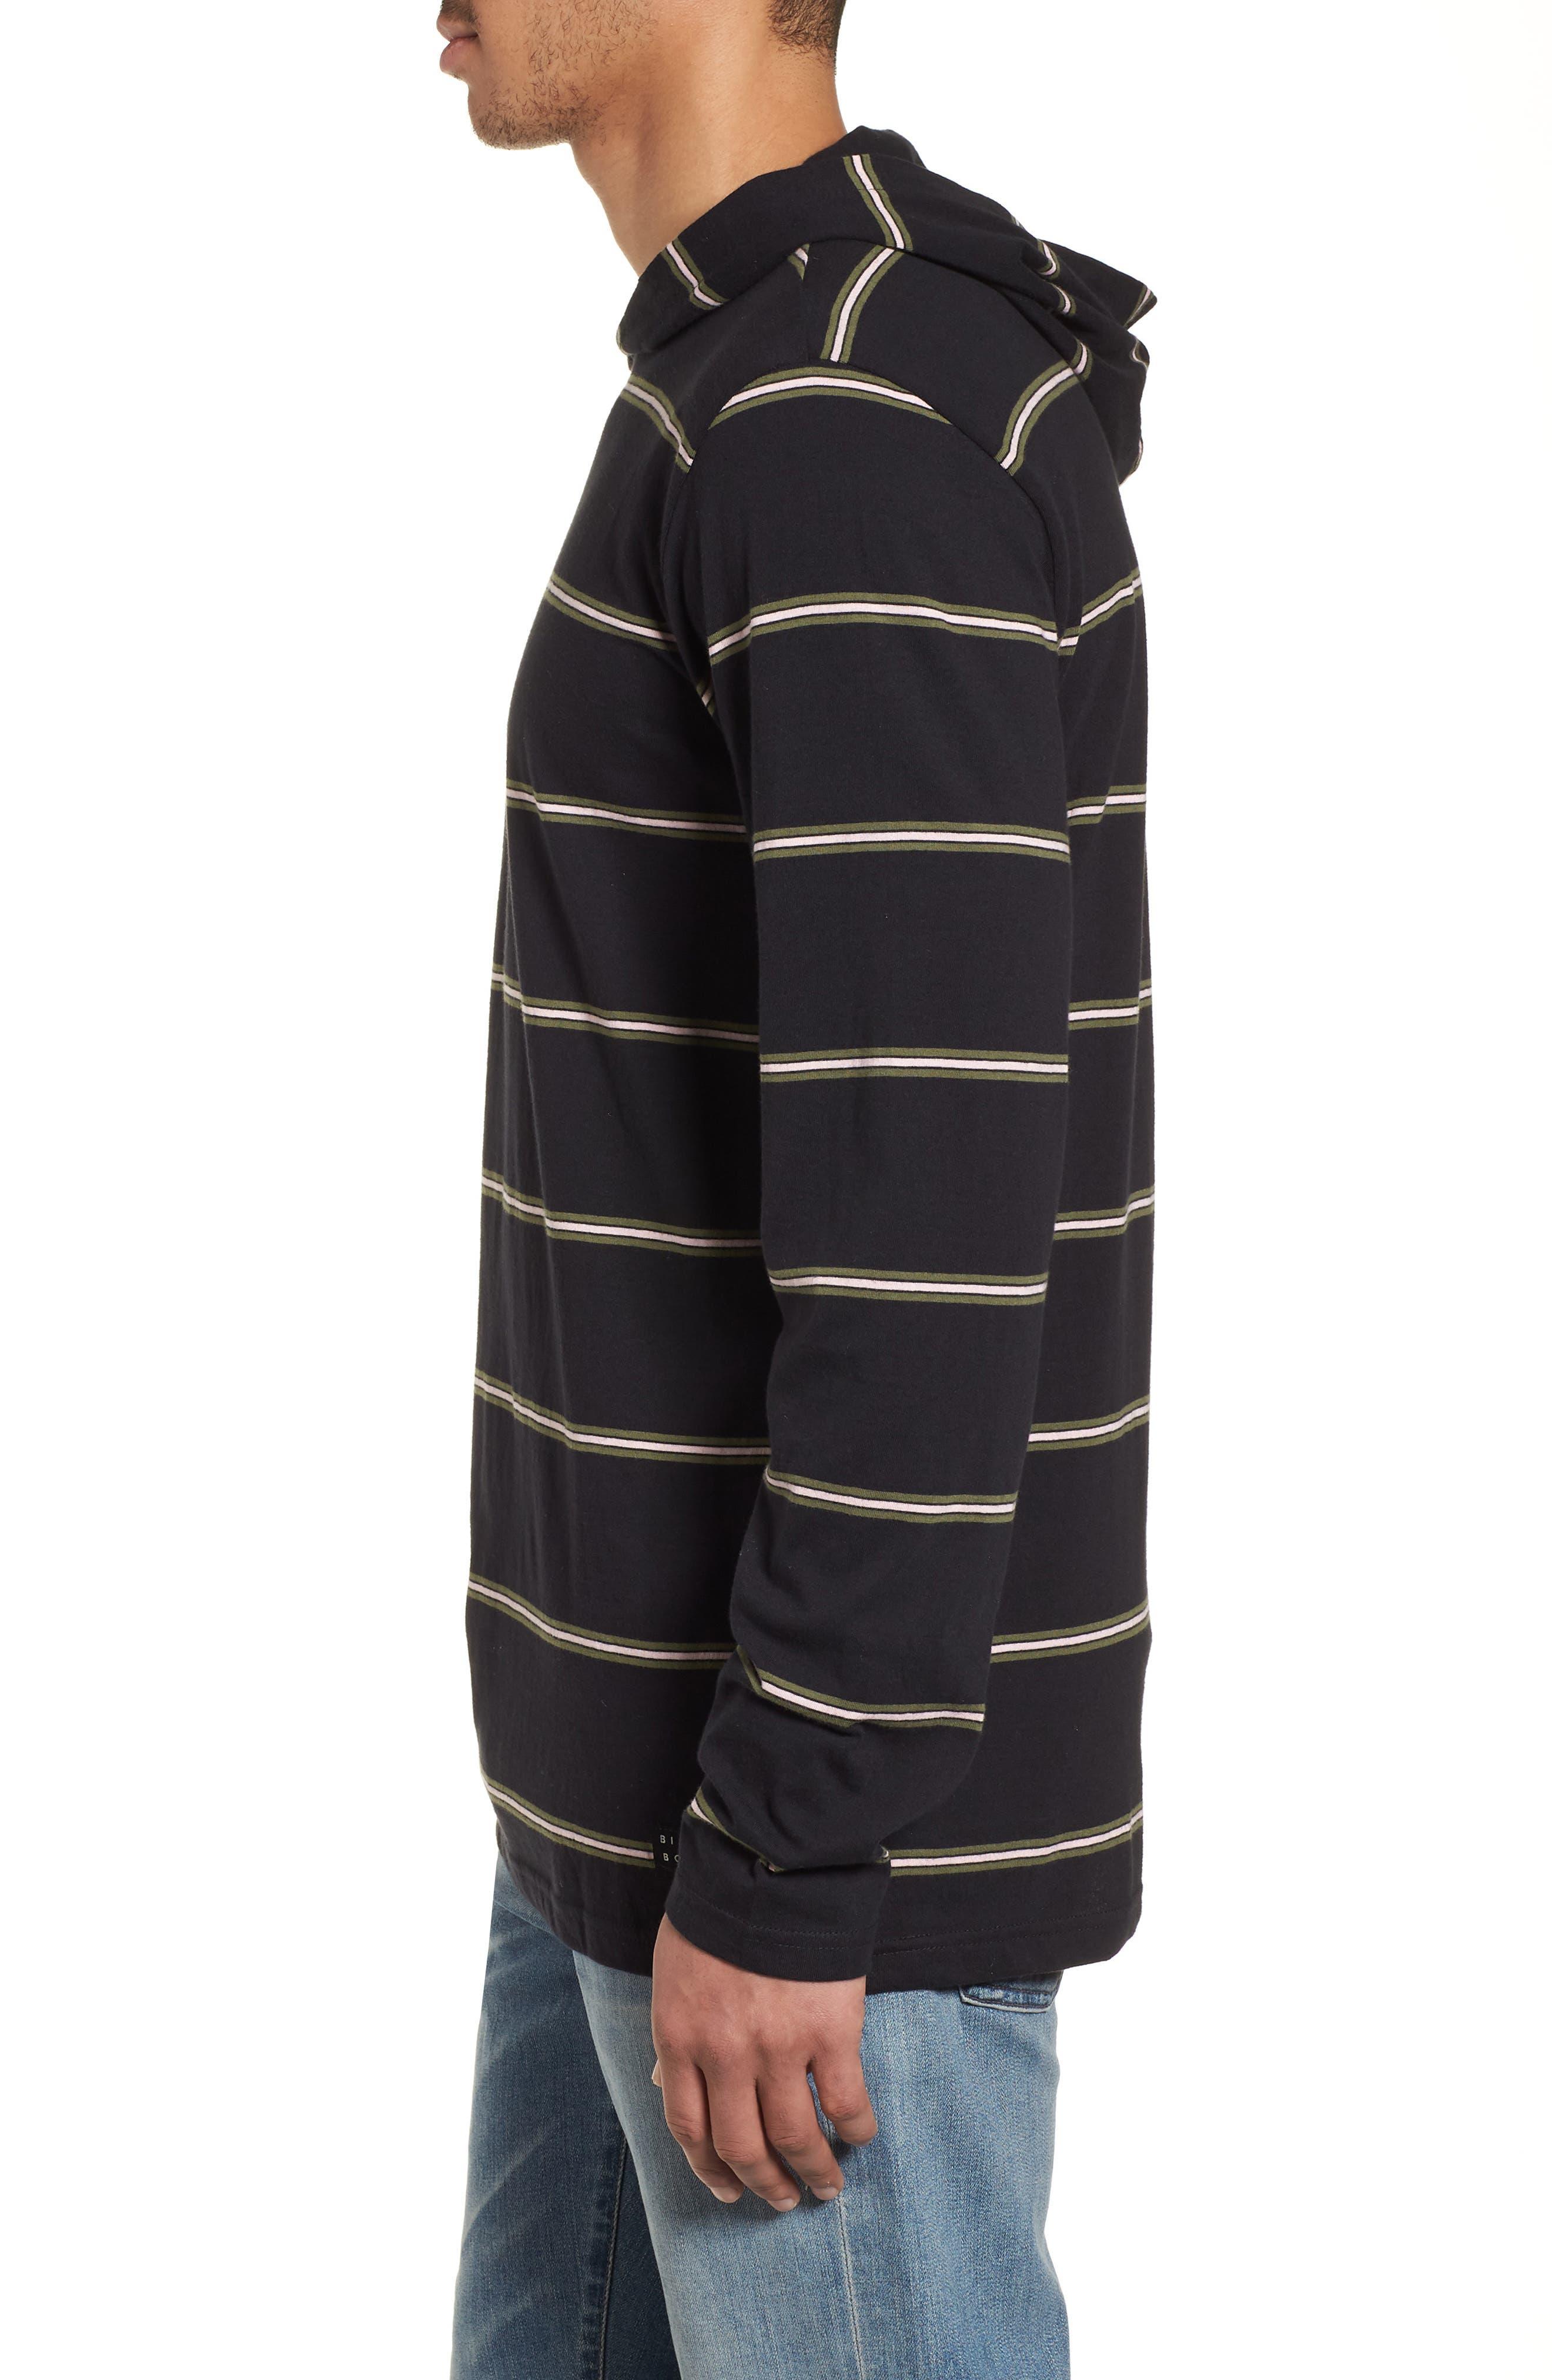 Die Cut Hooded Long Sleeve T-Shirt,                             Alternate thumbnail 3, color,                             001